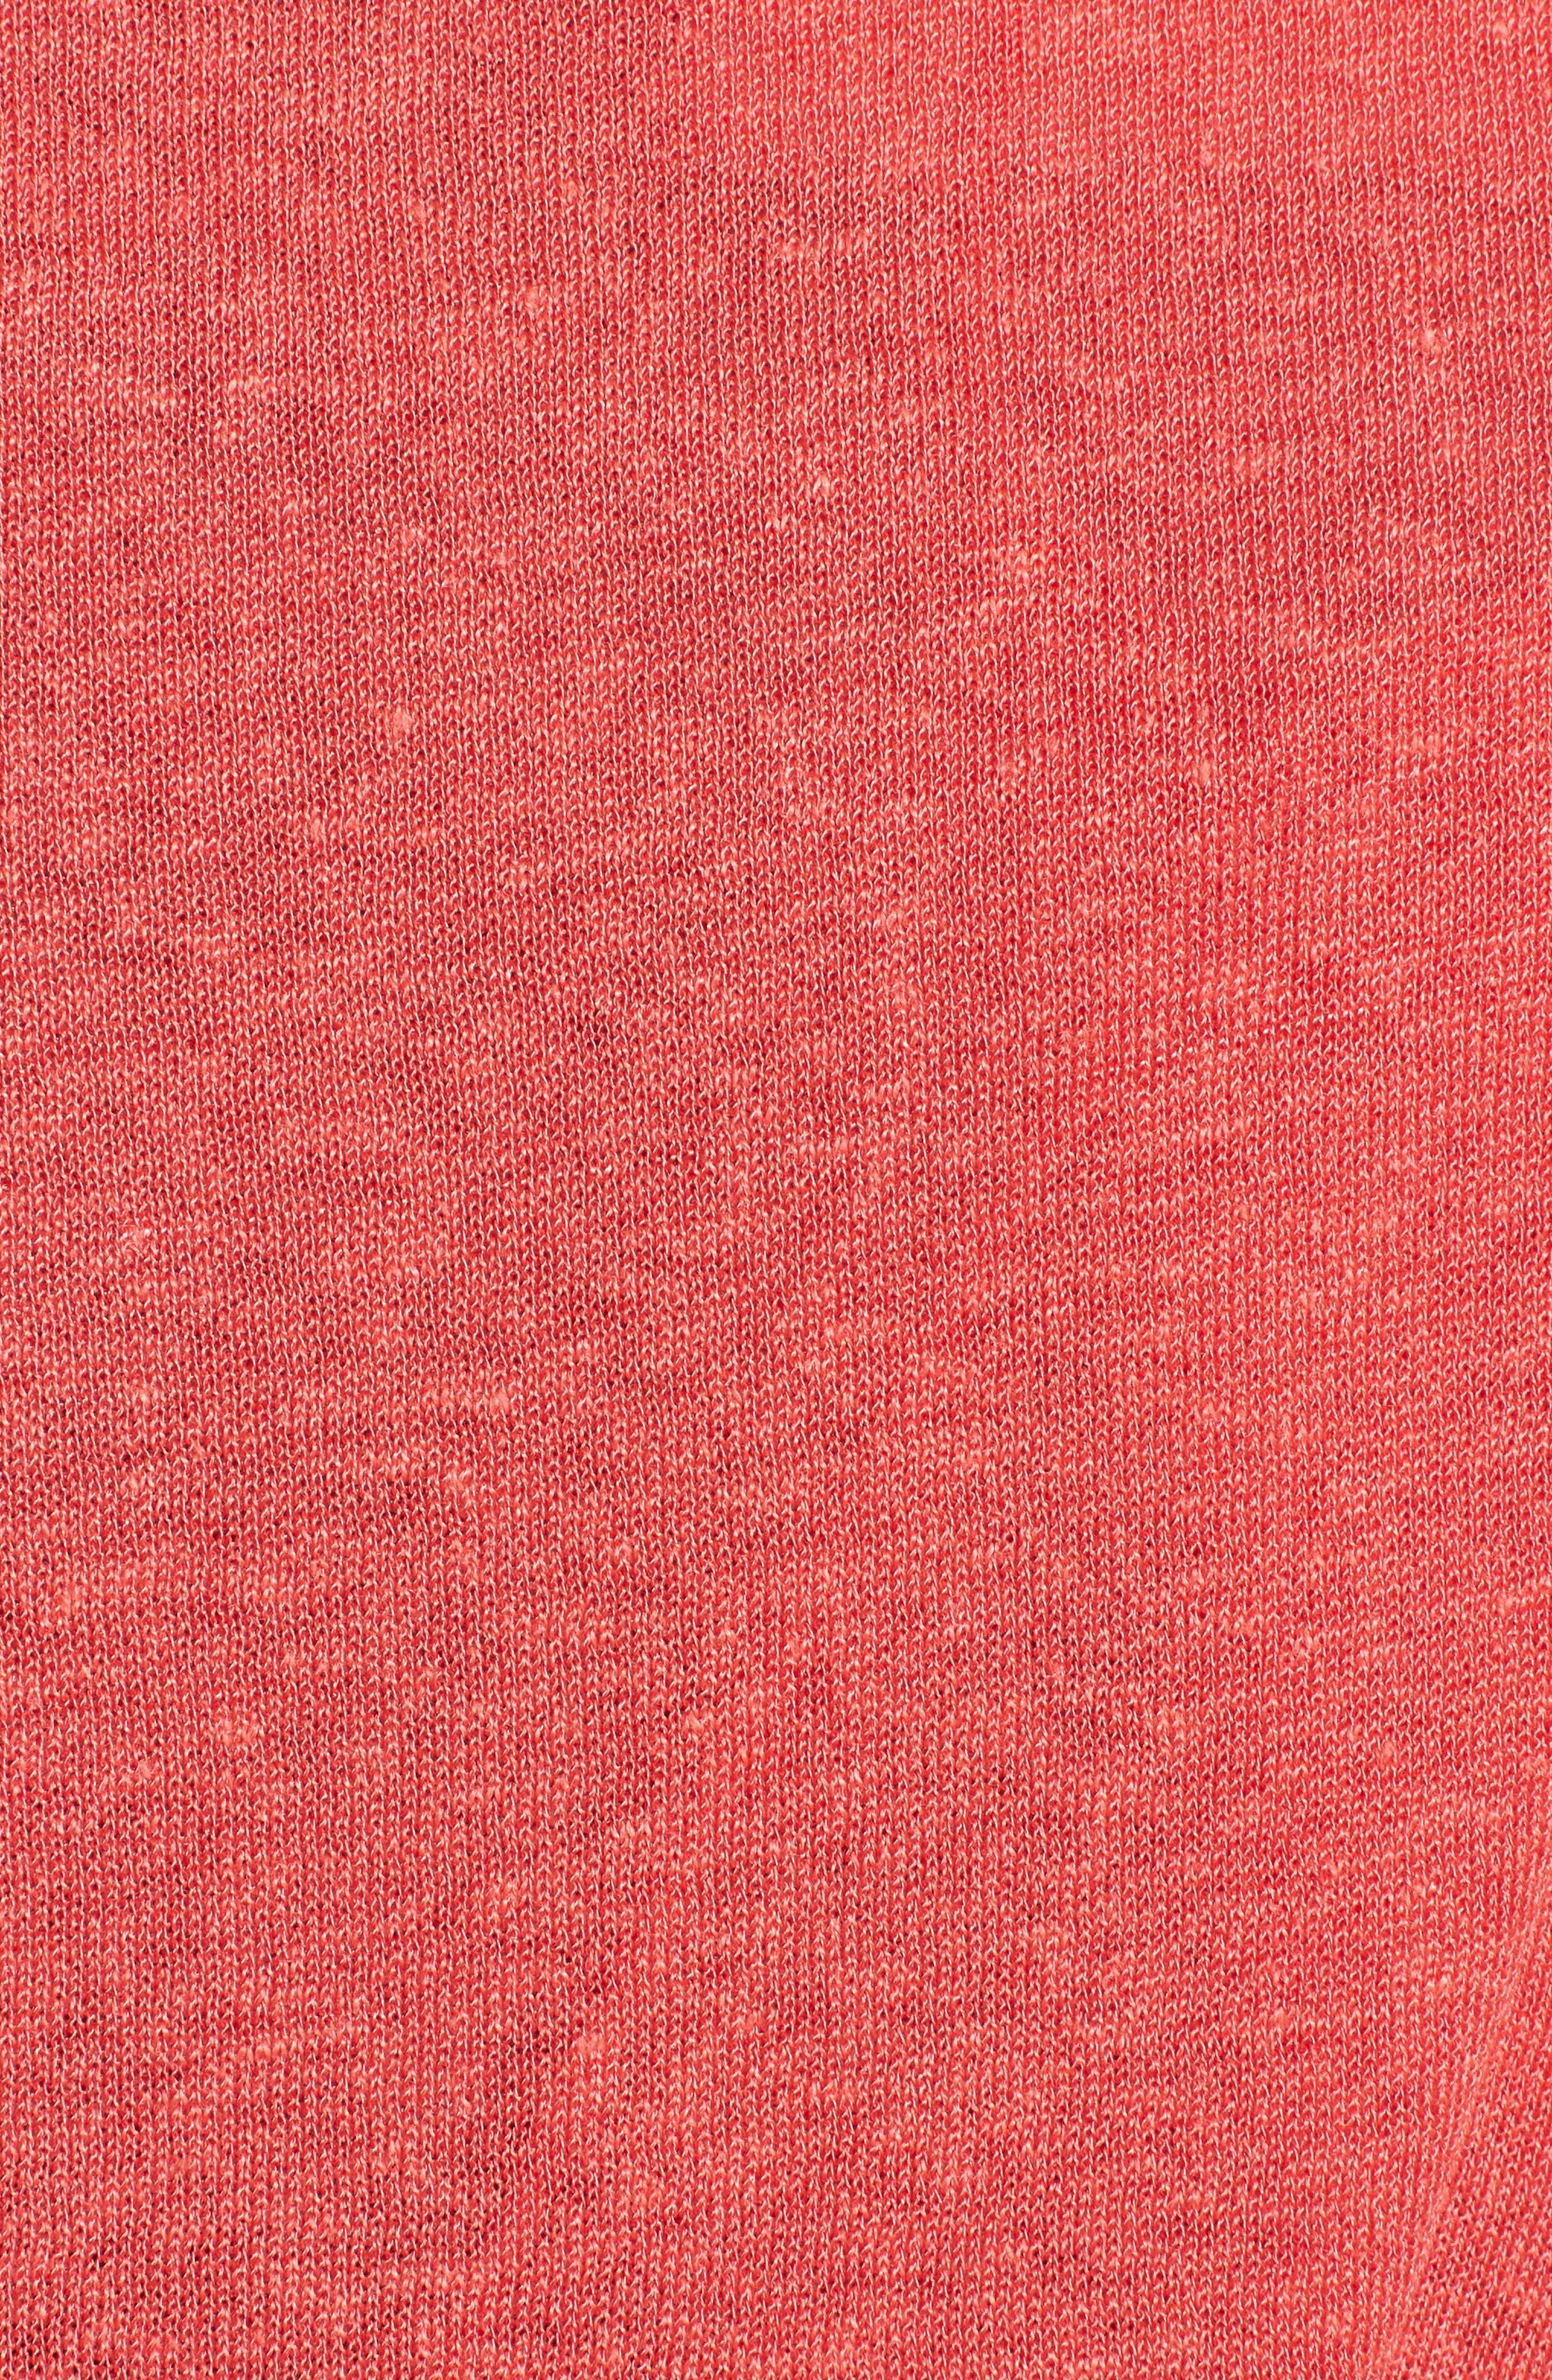 Alternate Image 5  - NIC+ZOE '4-Way' Convertible Three Quarter Sleeve Cardigan (Regular and Petite)